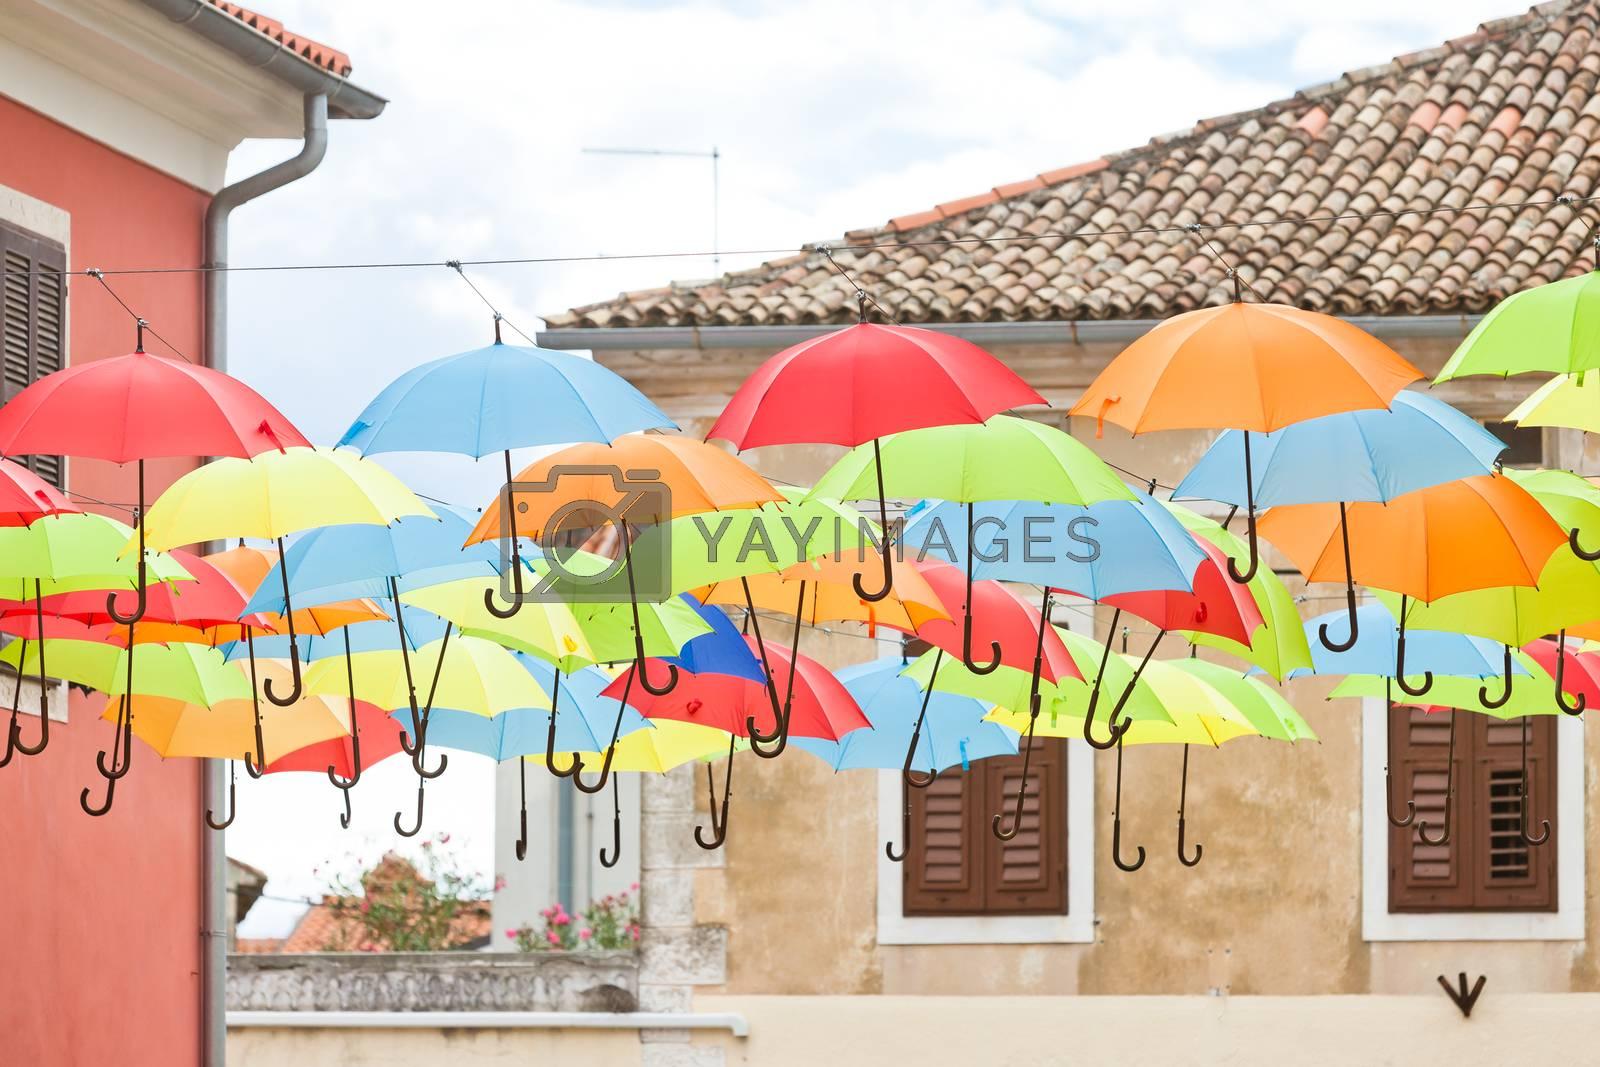 Novigrad, Istria, Croatia, Europe - Colorful umbrellas in the streets of Novigrad